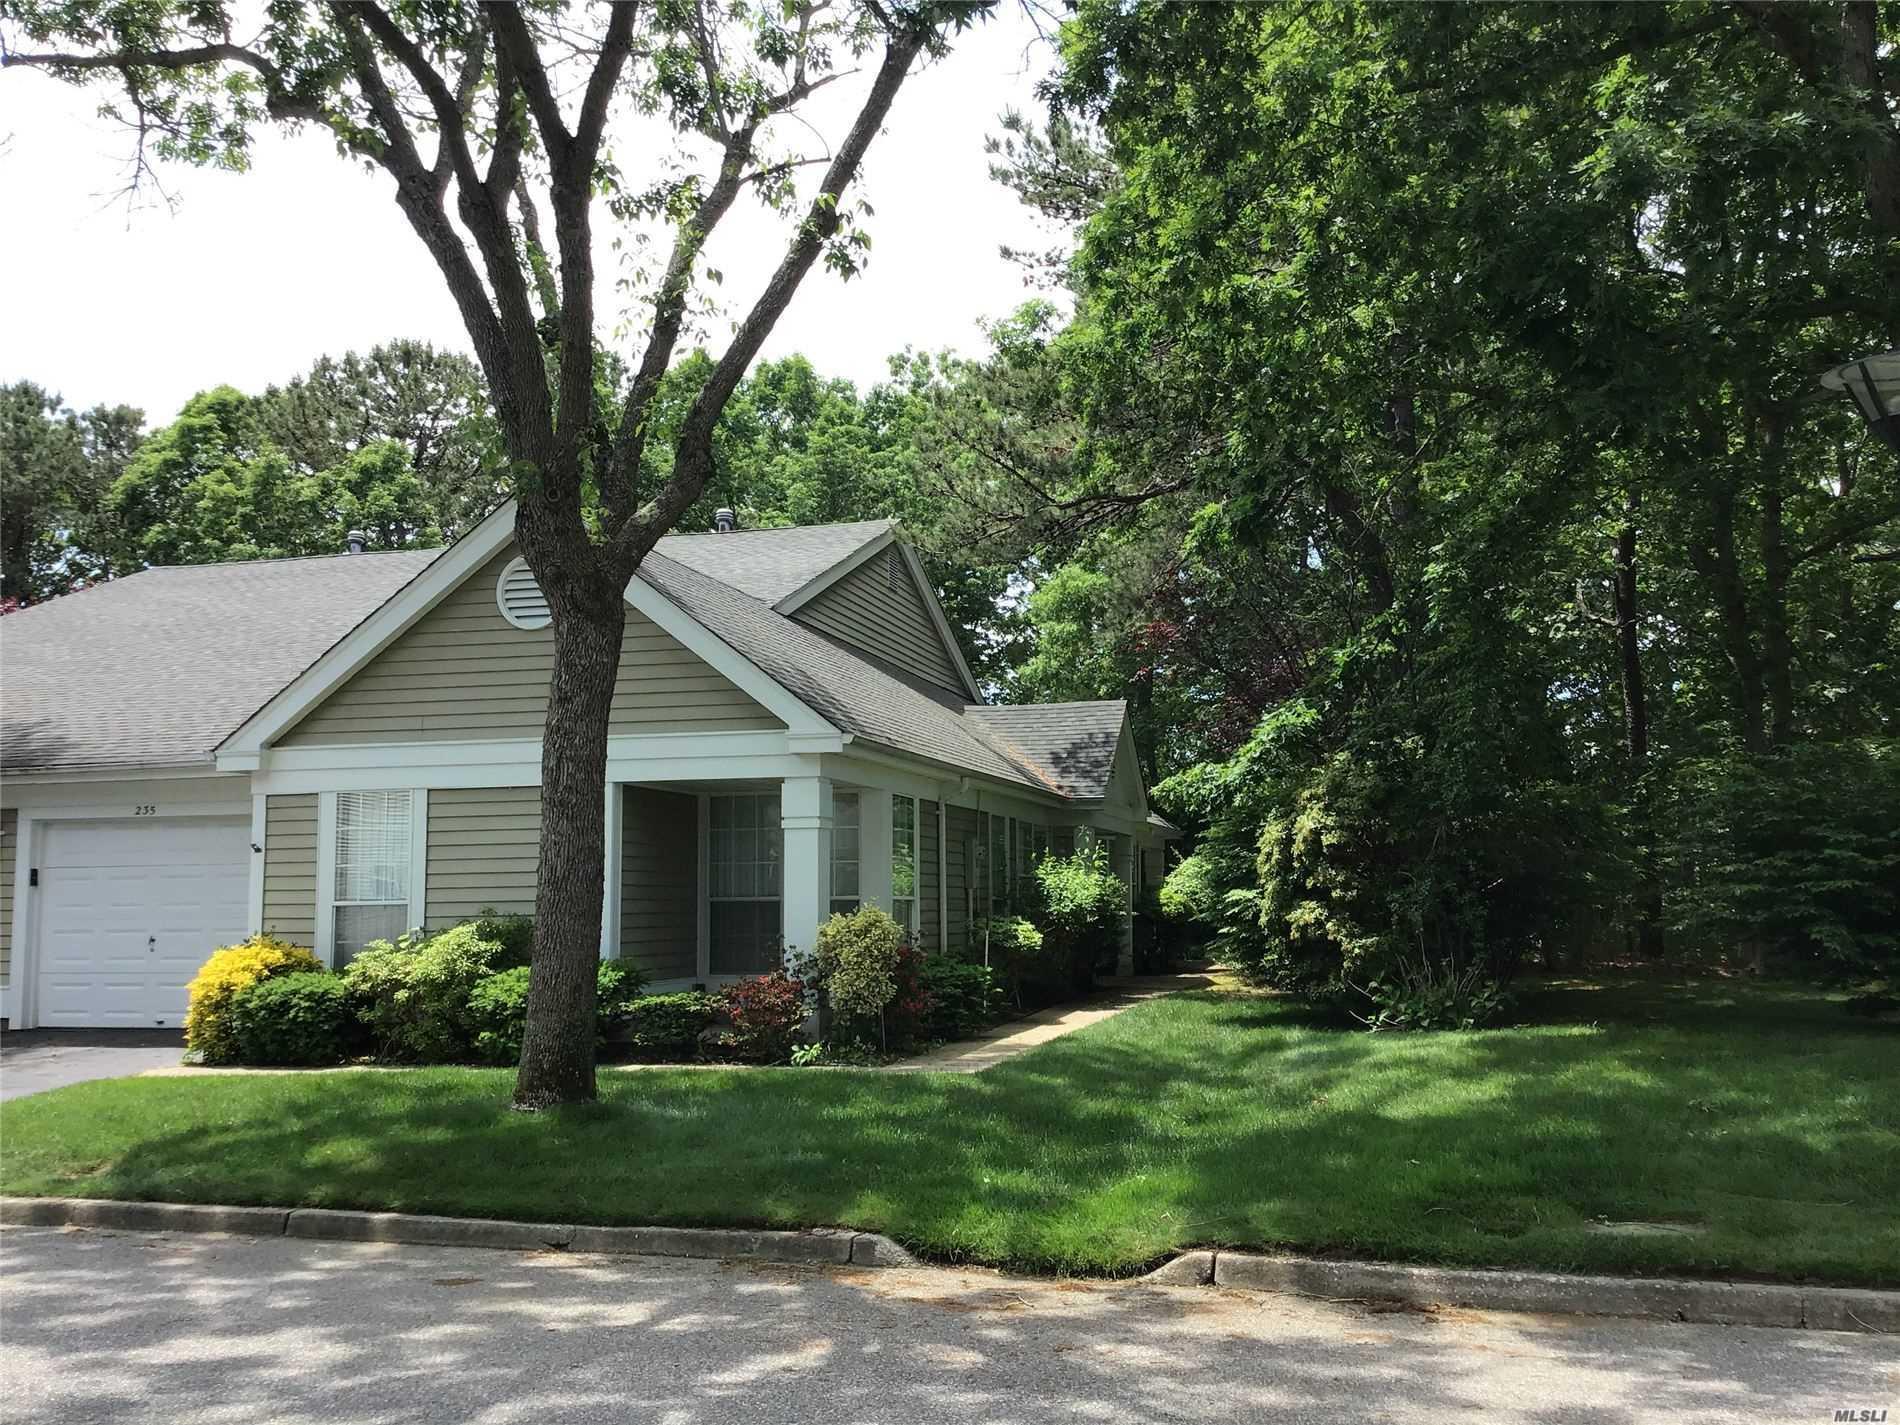 Property for sale at 235 Glen Drive, Ridge NY 11961, Ridge,  New York 11961